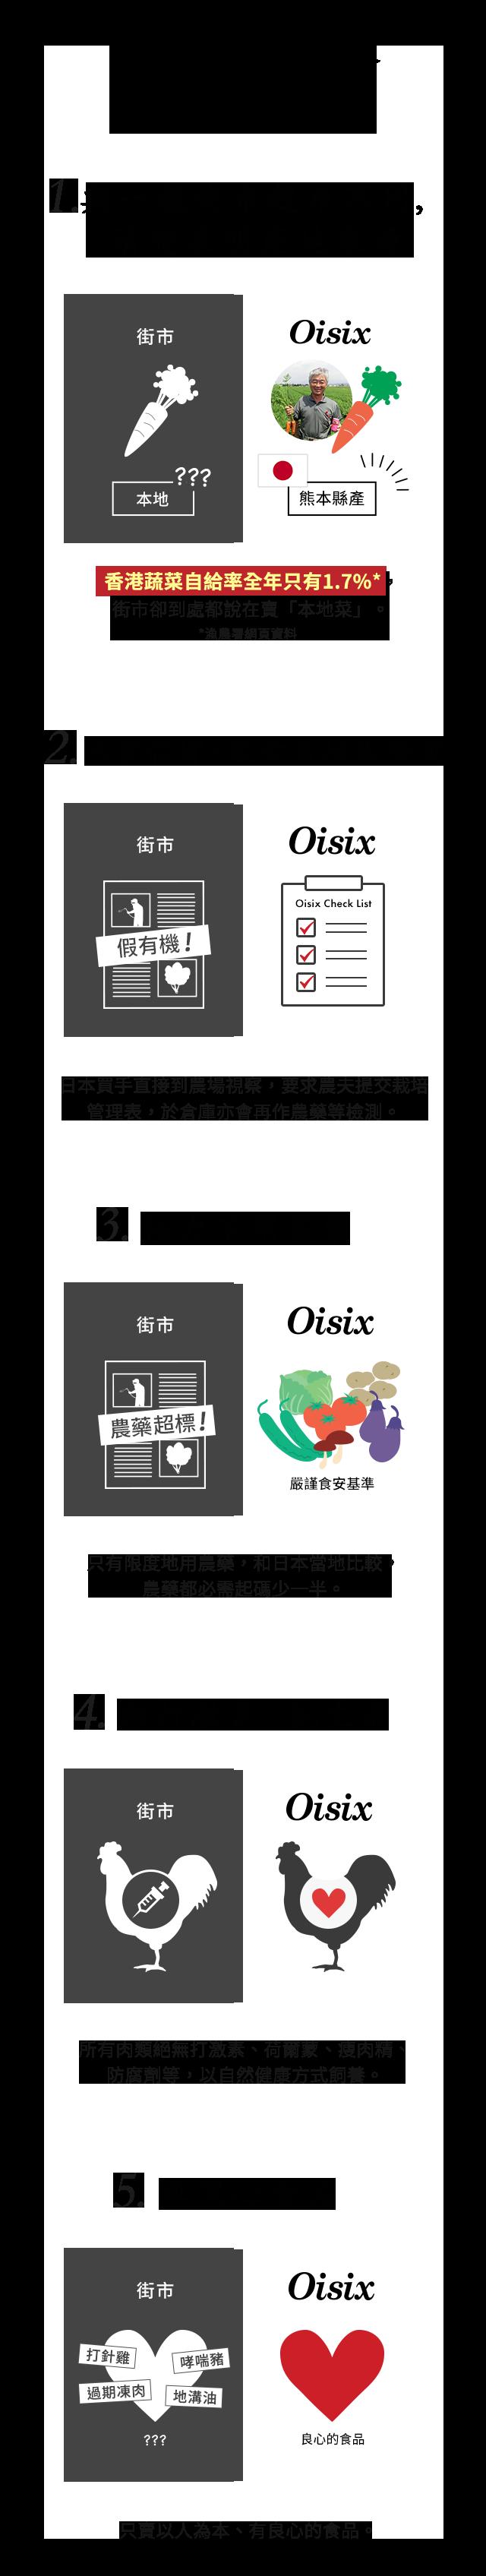 Oisix5大好處